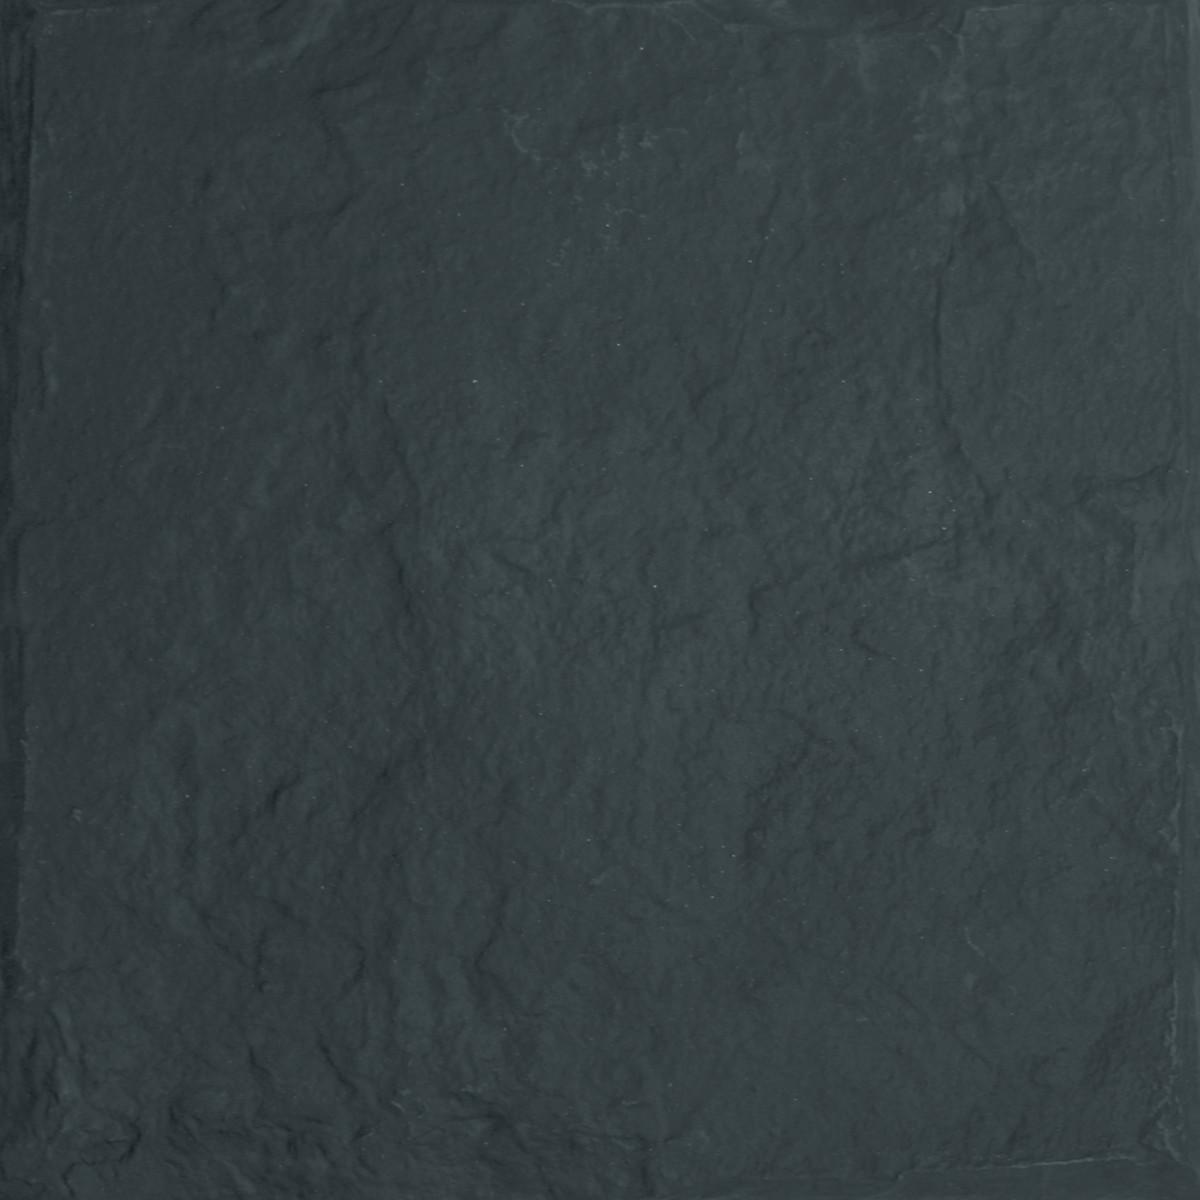 Piastrella 40 x 40 cm x 32 mm ardesia: prezzi e offerte online